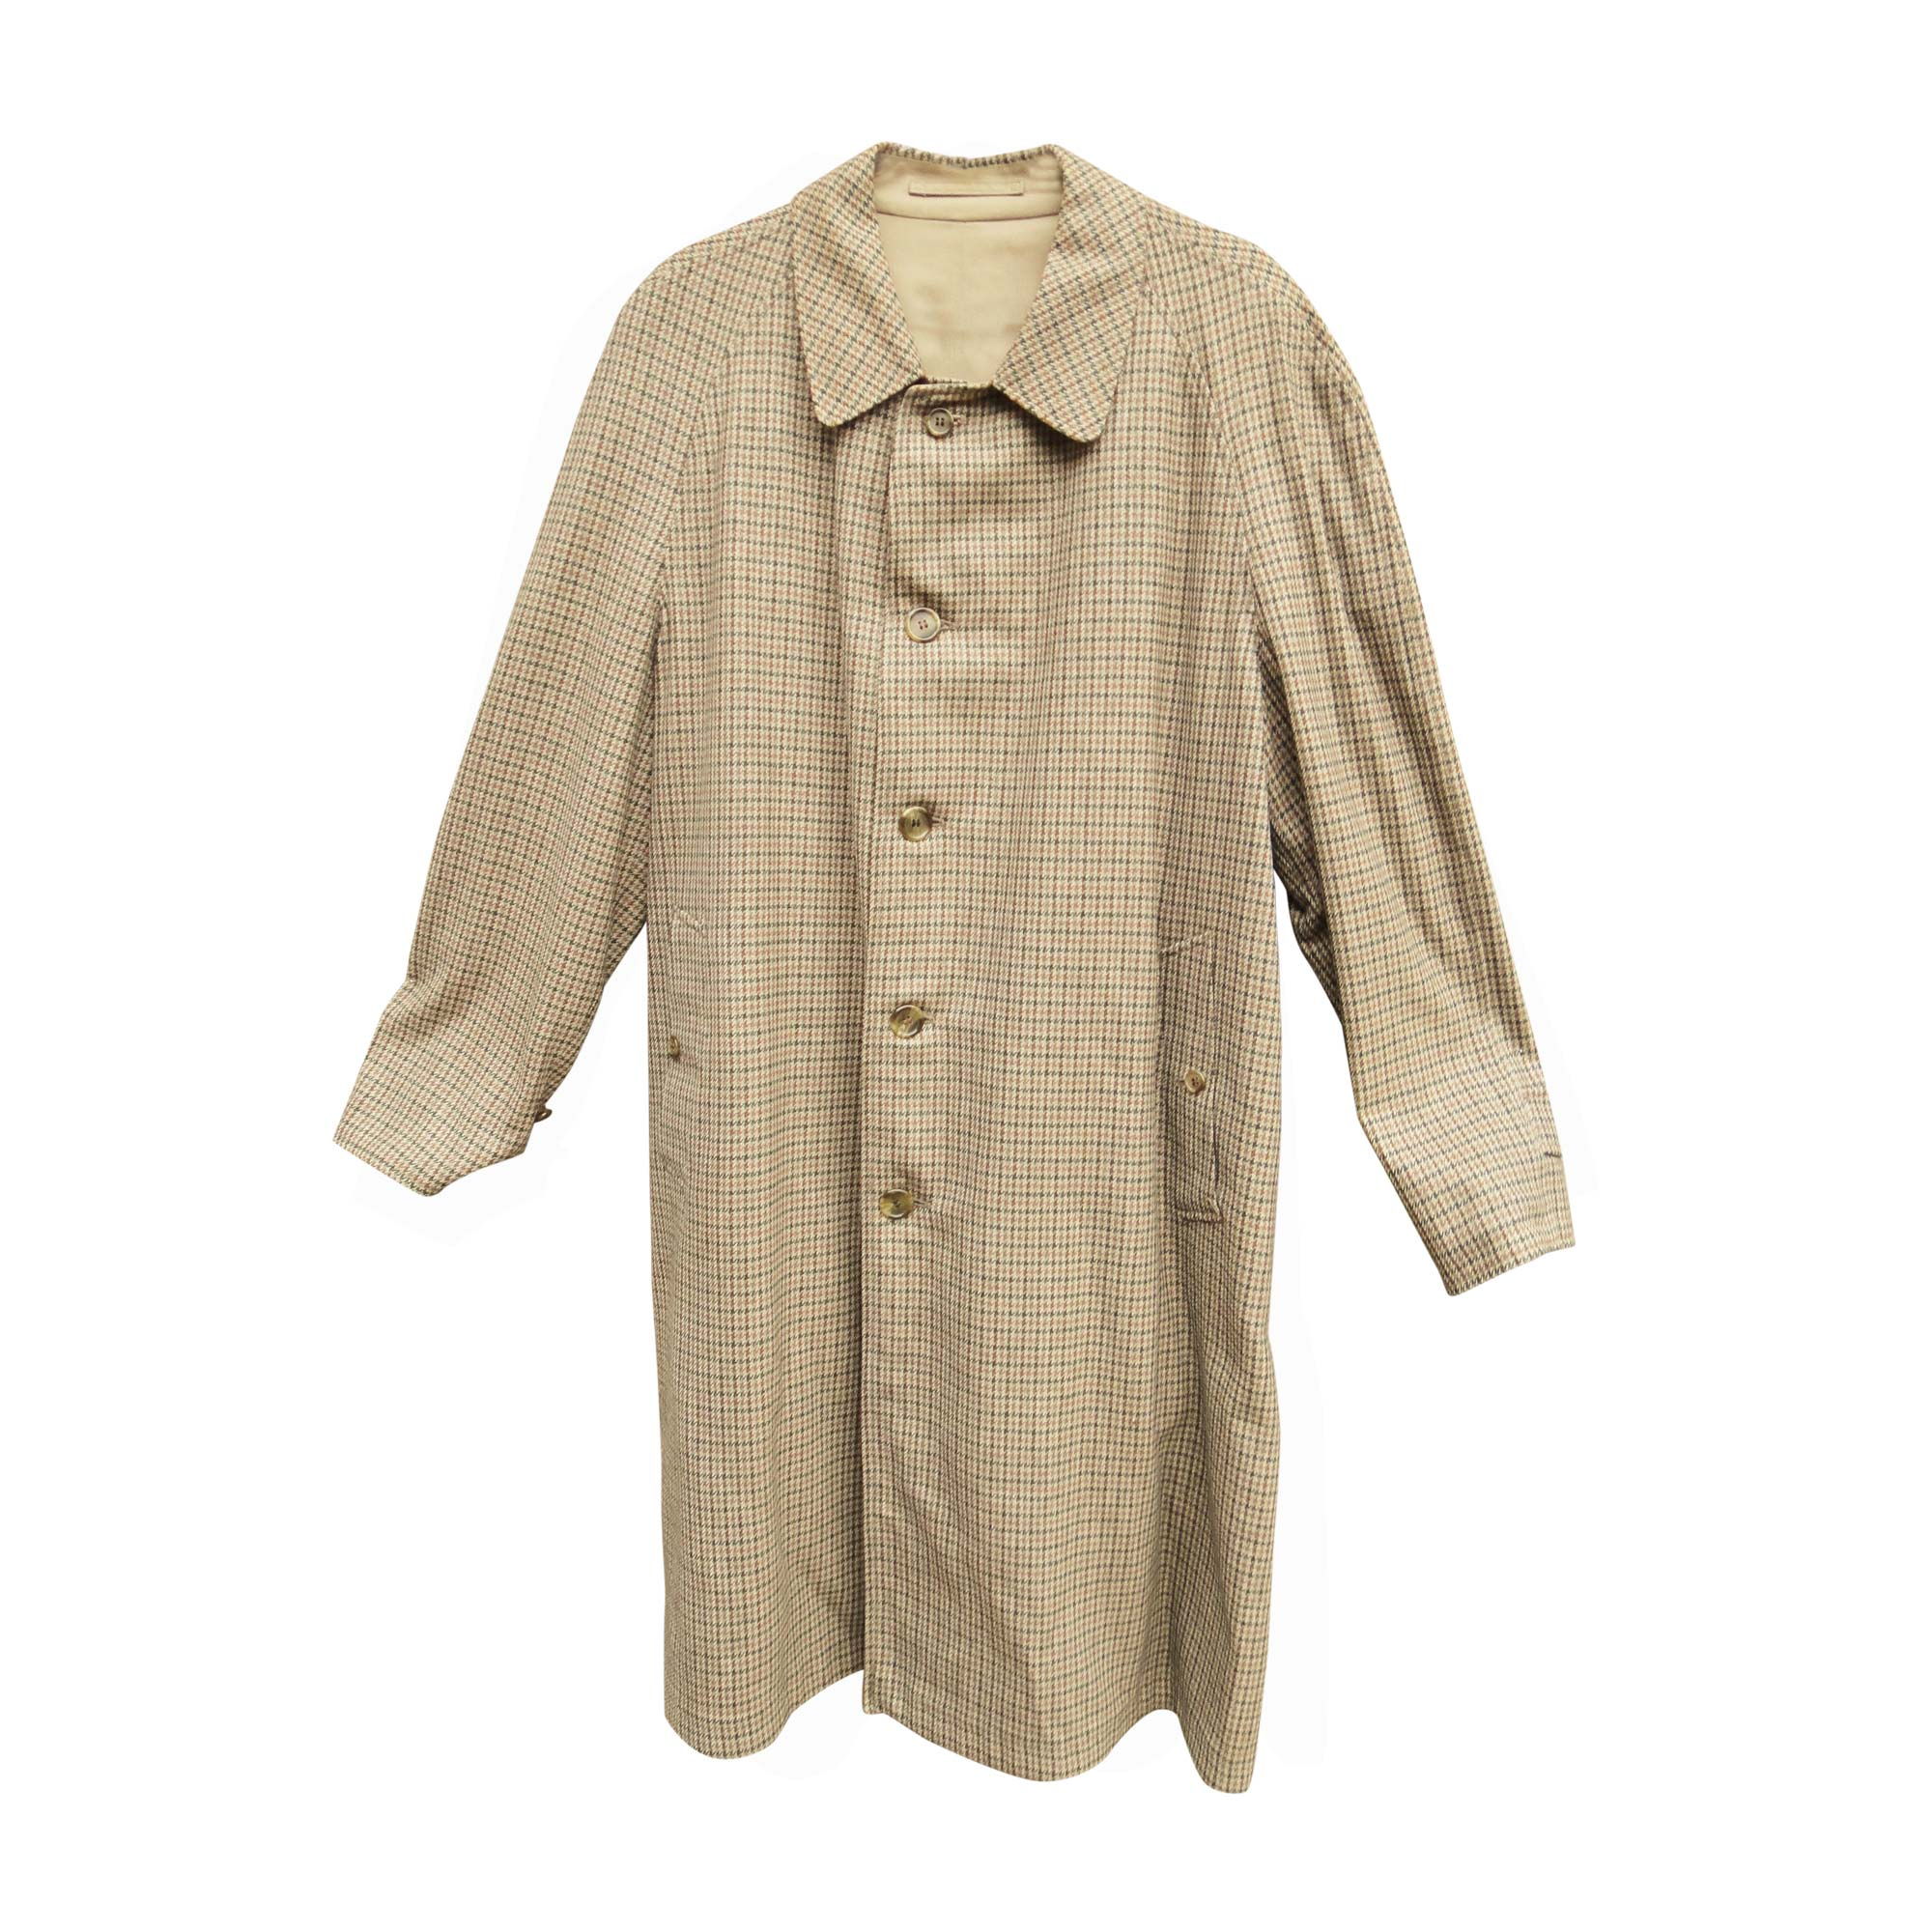 Manteau gabardine jusqu'à 85 %